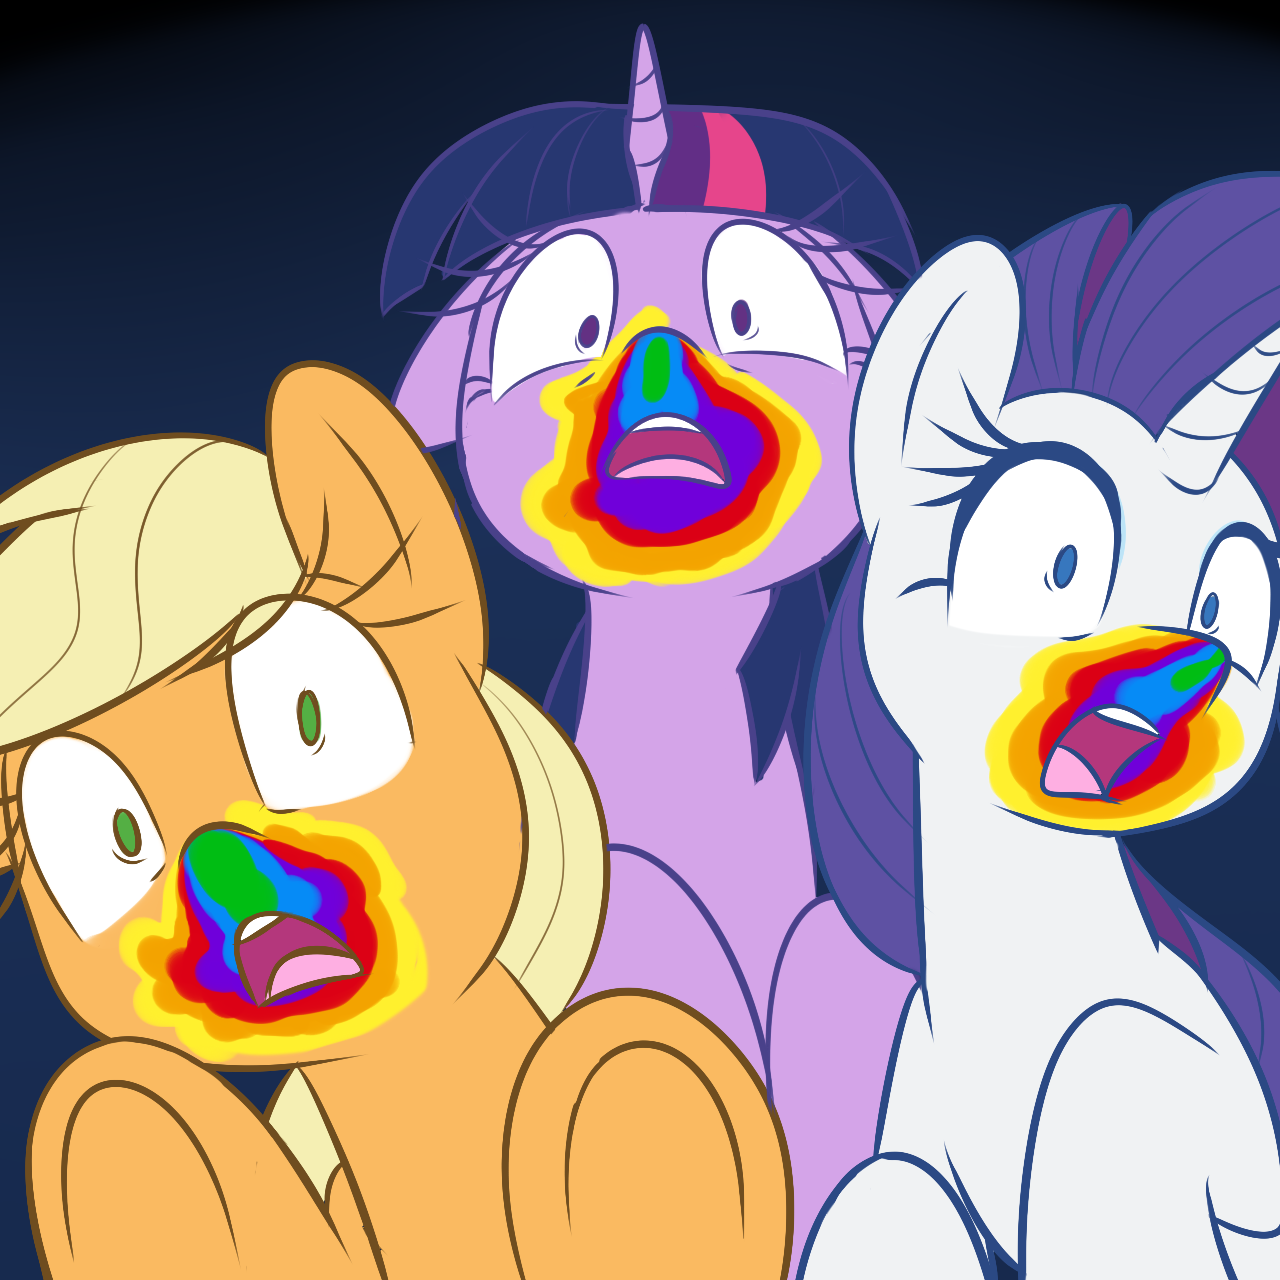 Sparkle derpibooru my little pony friendship is magic imageboard